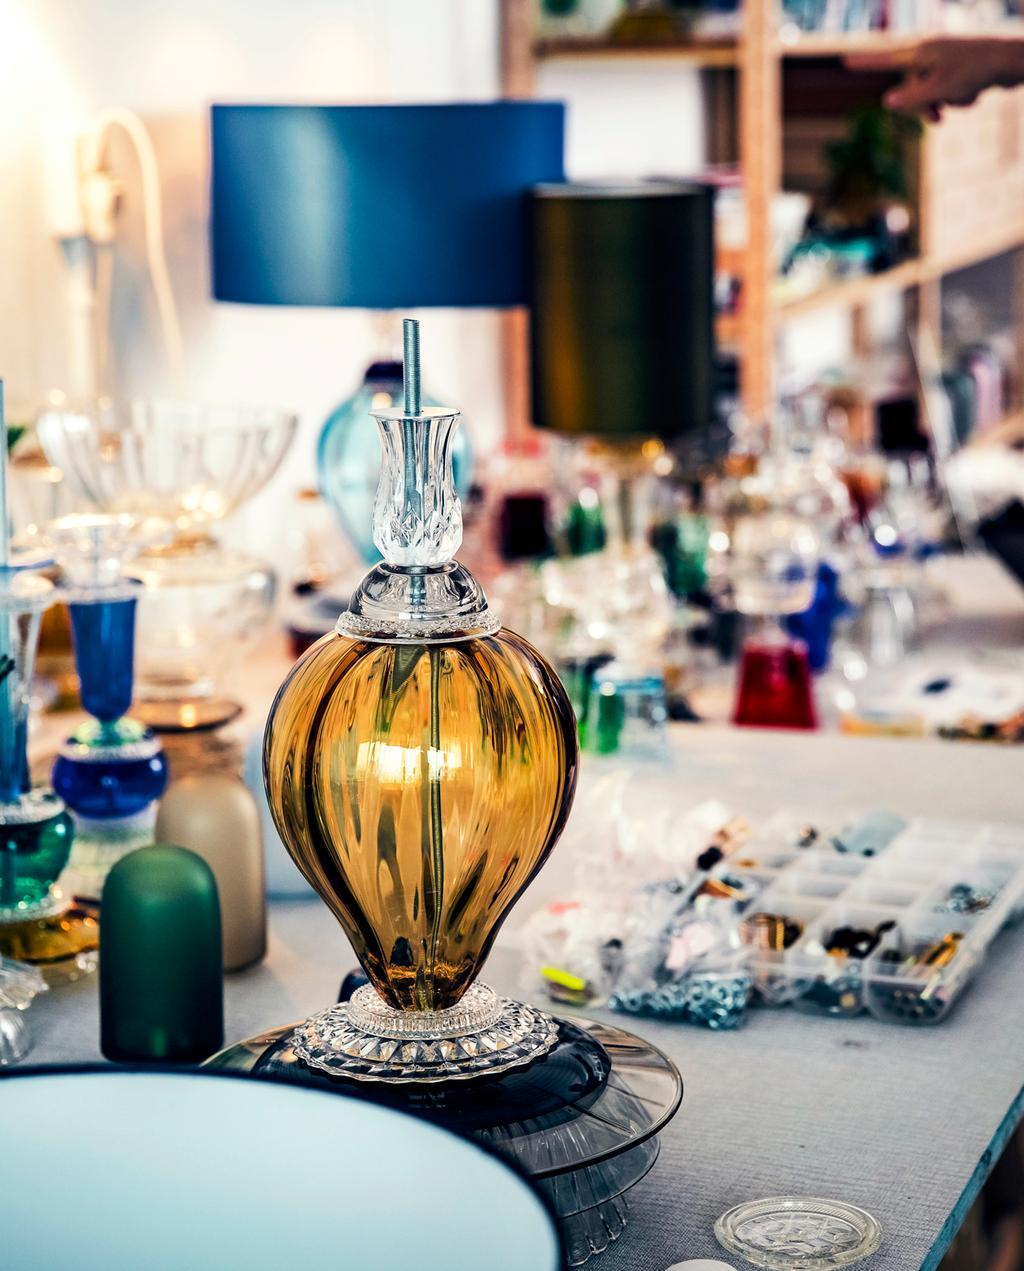 vtwonen 12-2019 | Ambacht Roos glas lamp tafellamp